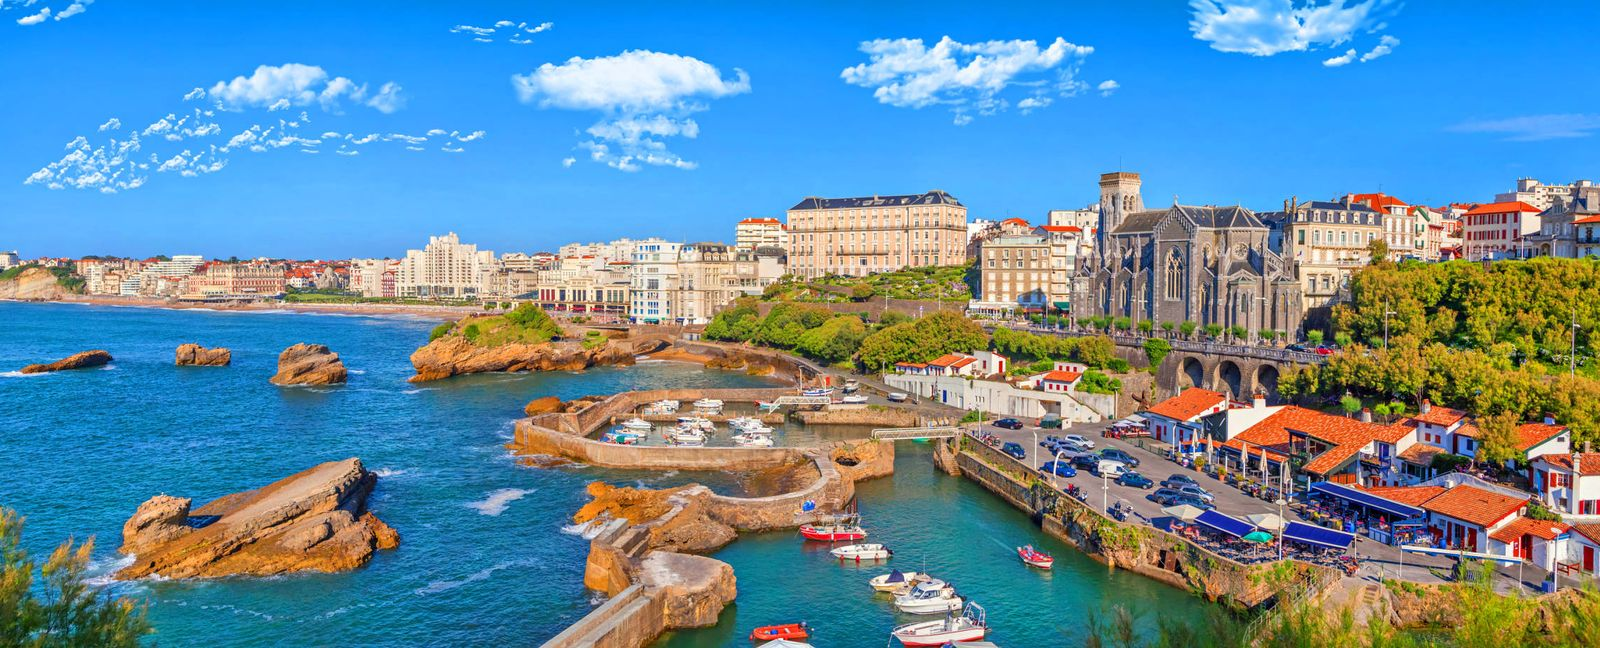 Foto: Biarritz